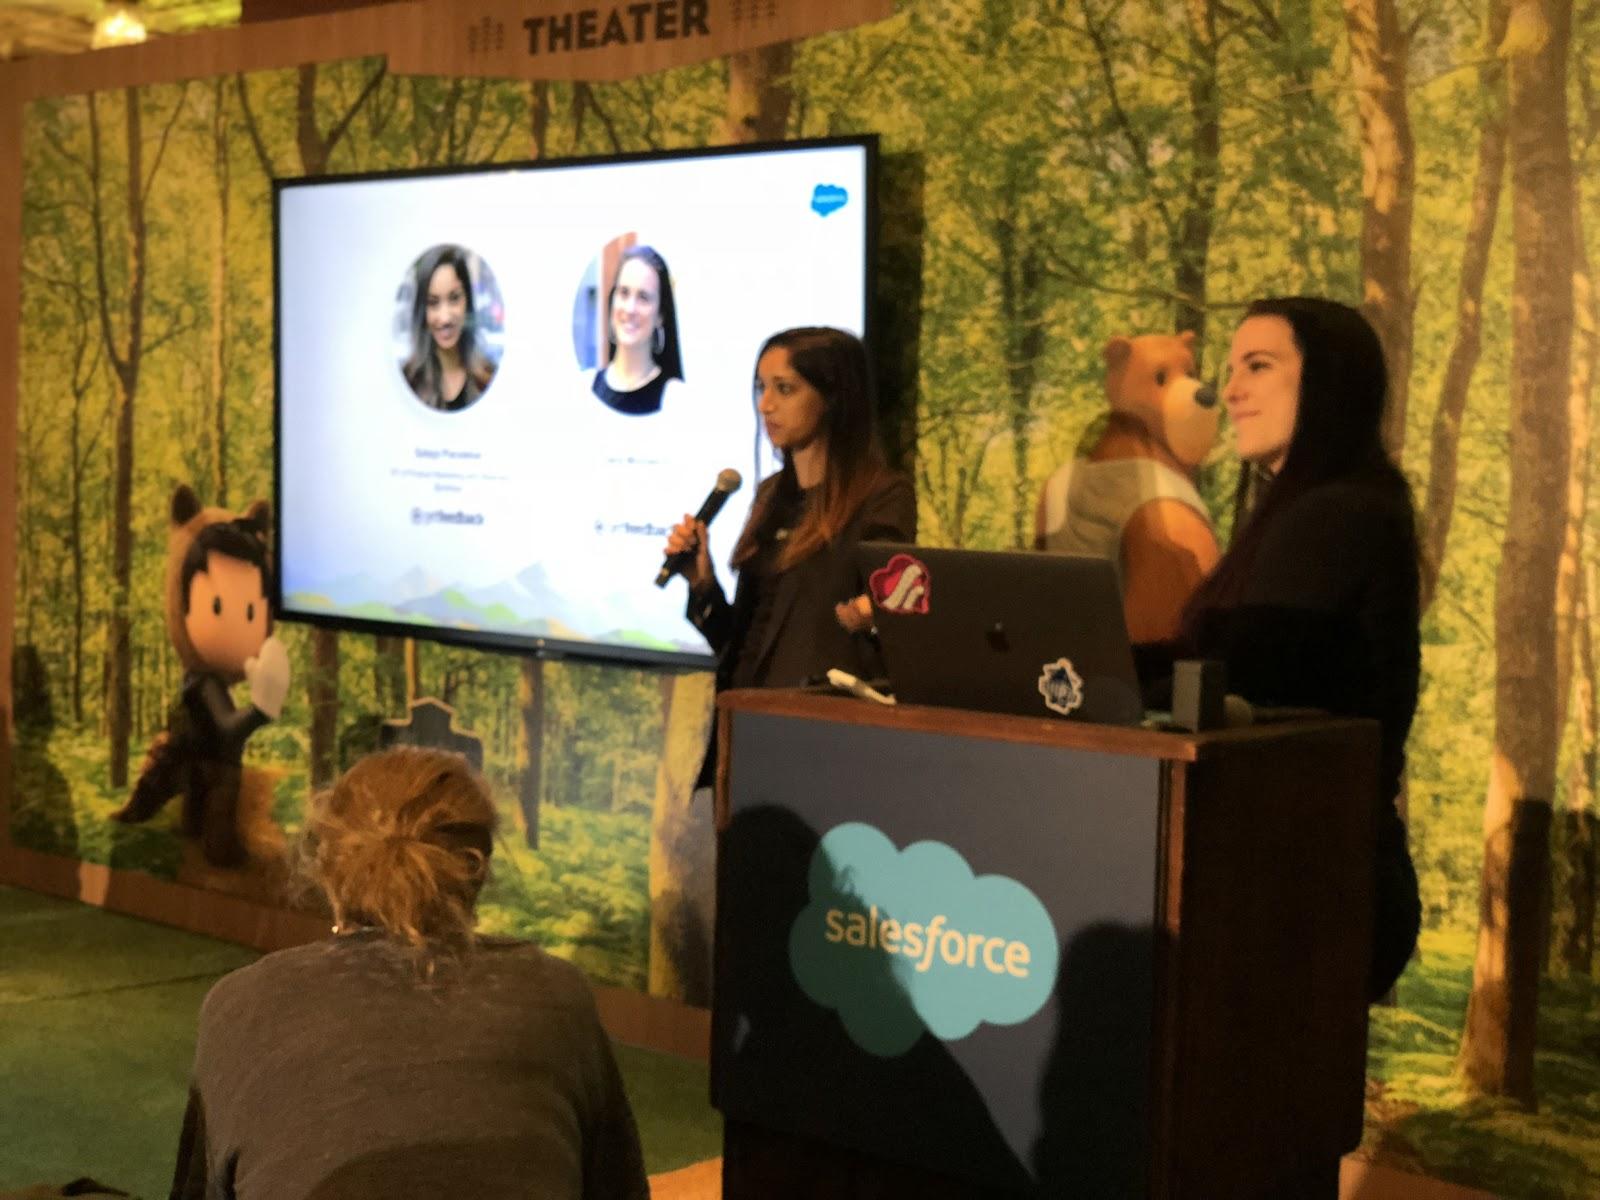 Dreamforce 2018 - Sateja Parulekar - VP of Product Marketing and Alliances, GetFeedback & Dara Monasch - Product Manager, GetFeedback